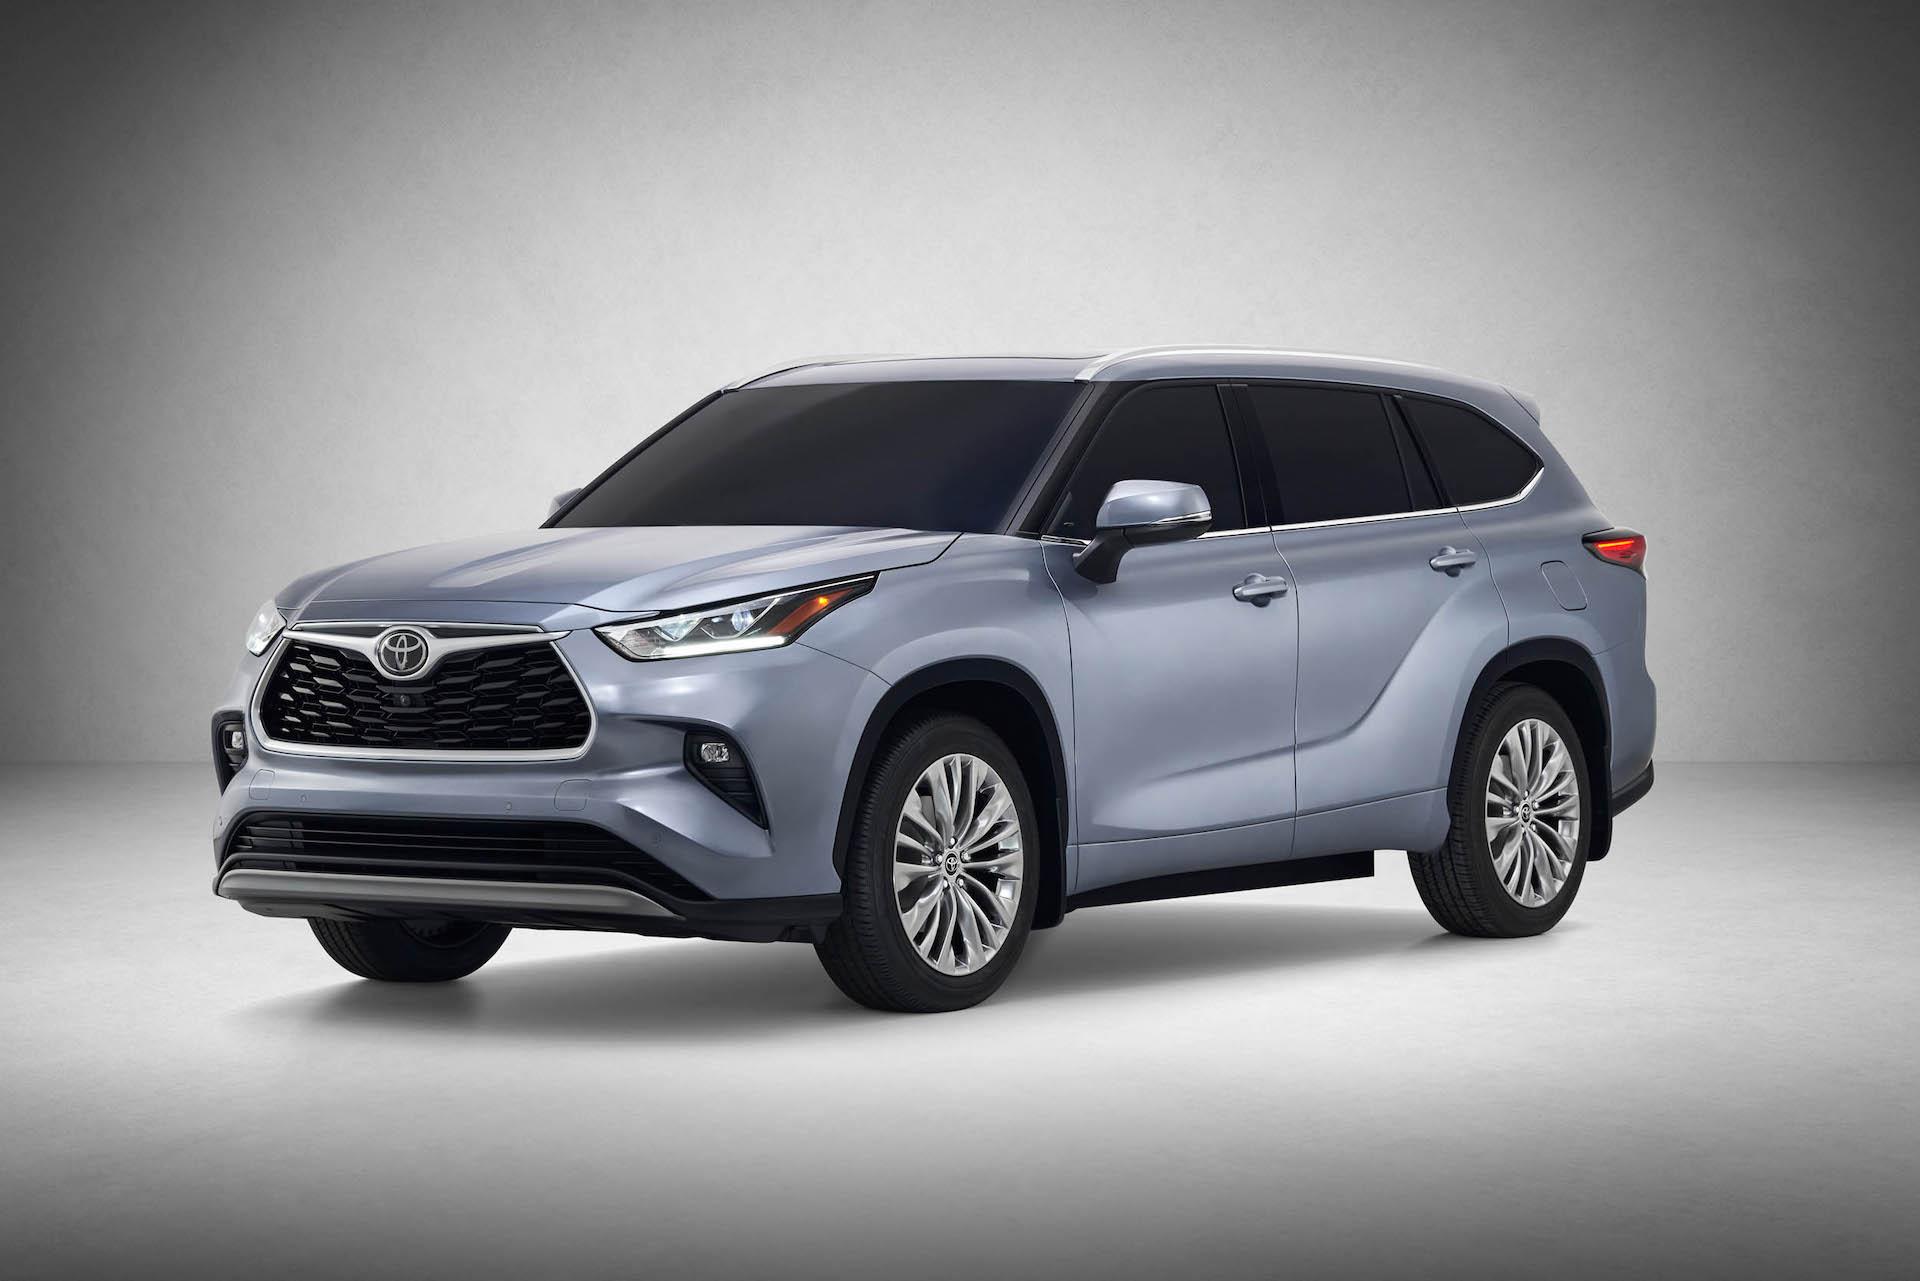 2020 Toyota Highlander preview